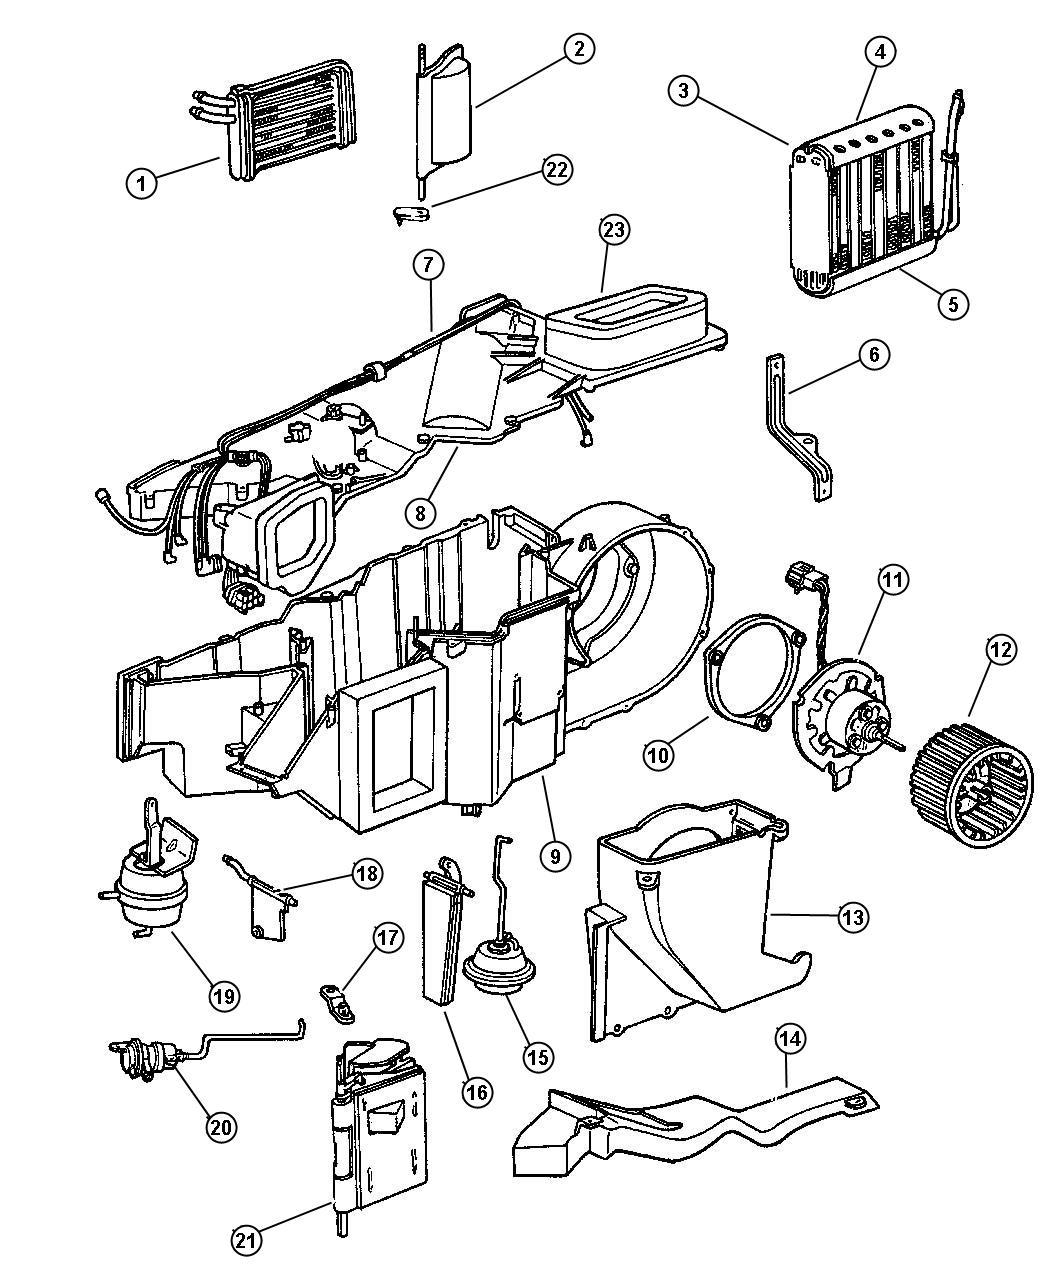 1997 Dodge Dakota Motor. Heater blower. Air, conditioning